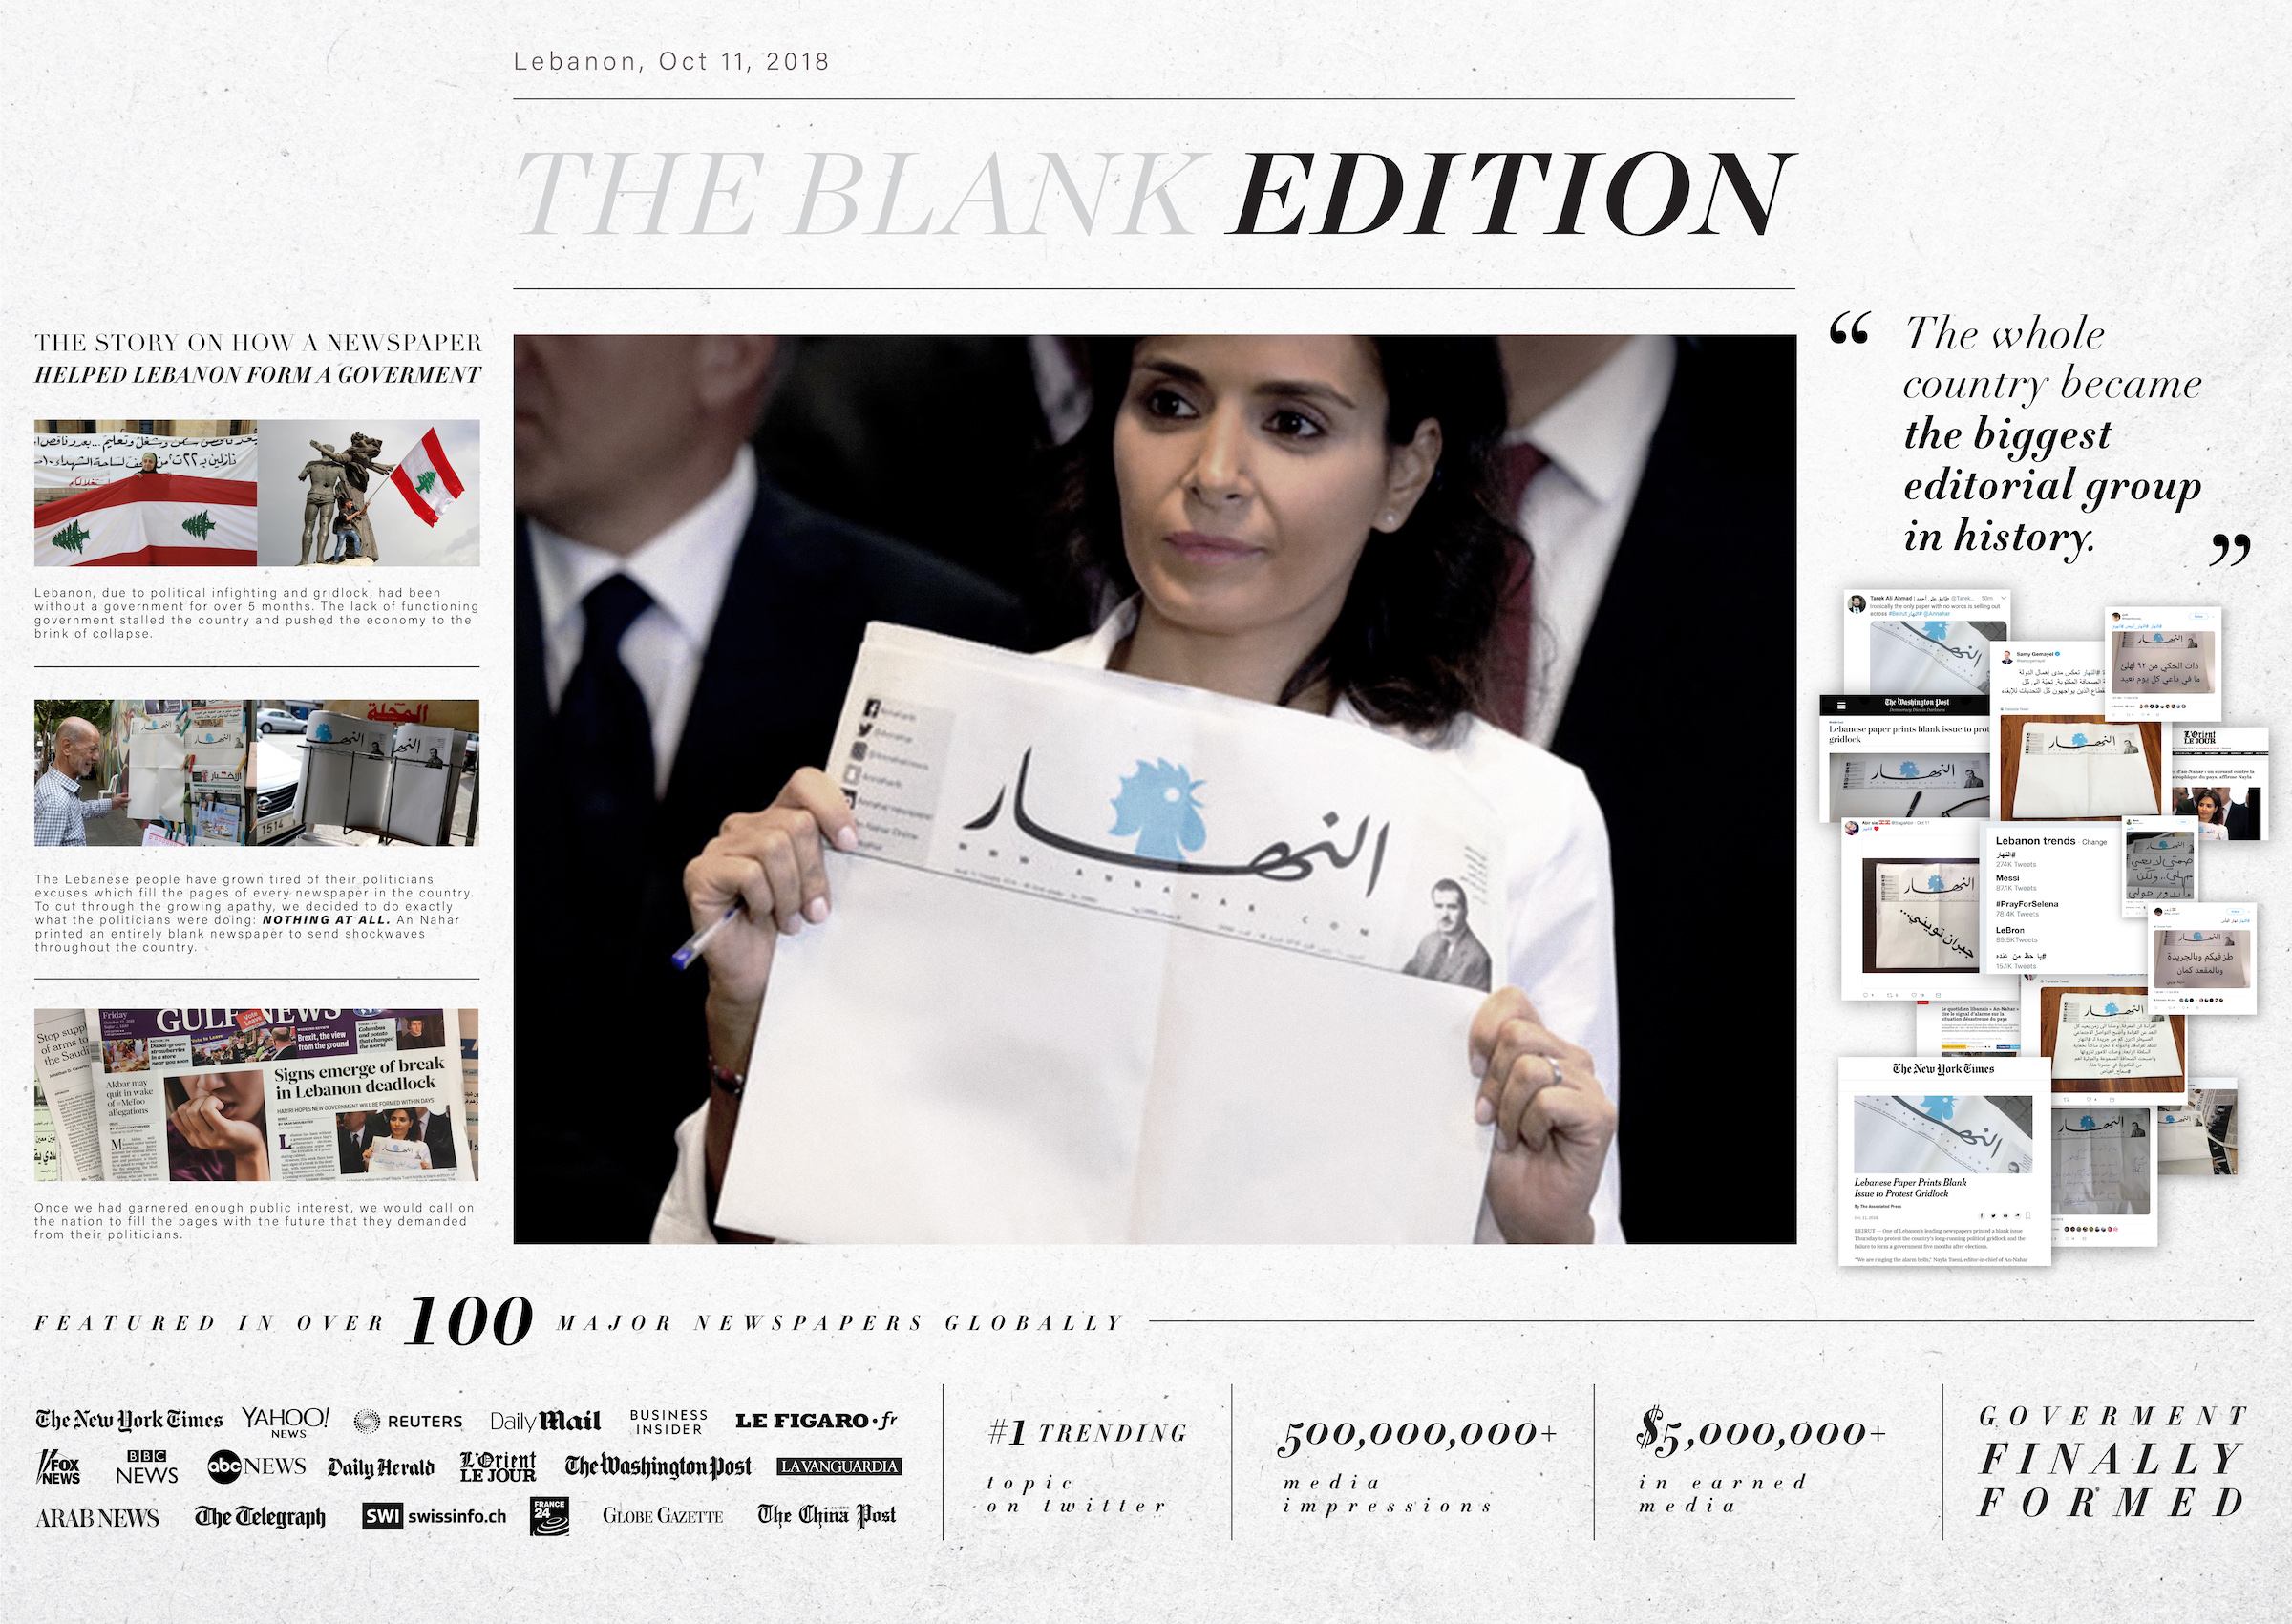 Al-Nahar: The Blank Edititon (Impact BBDO)